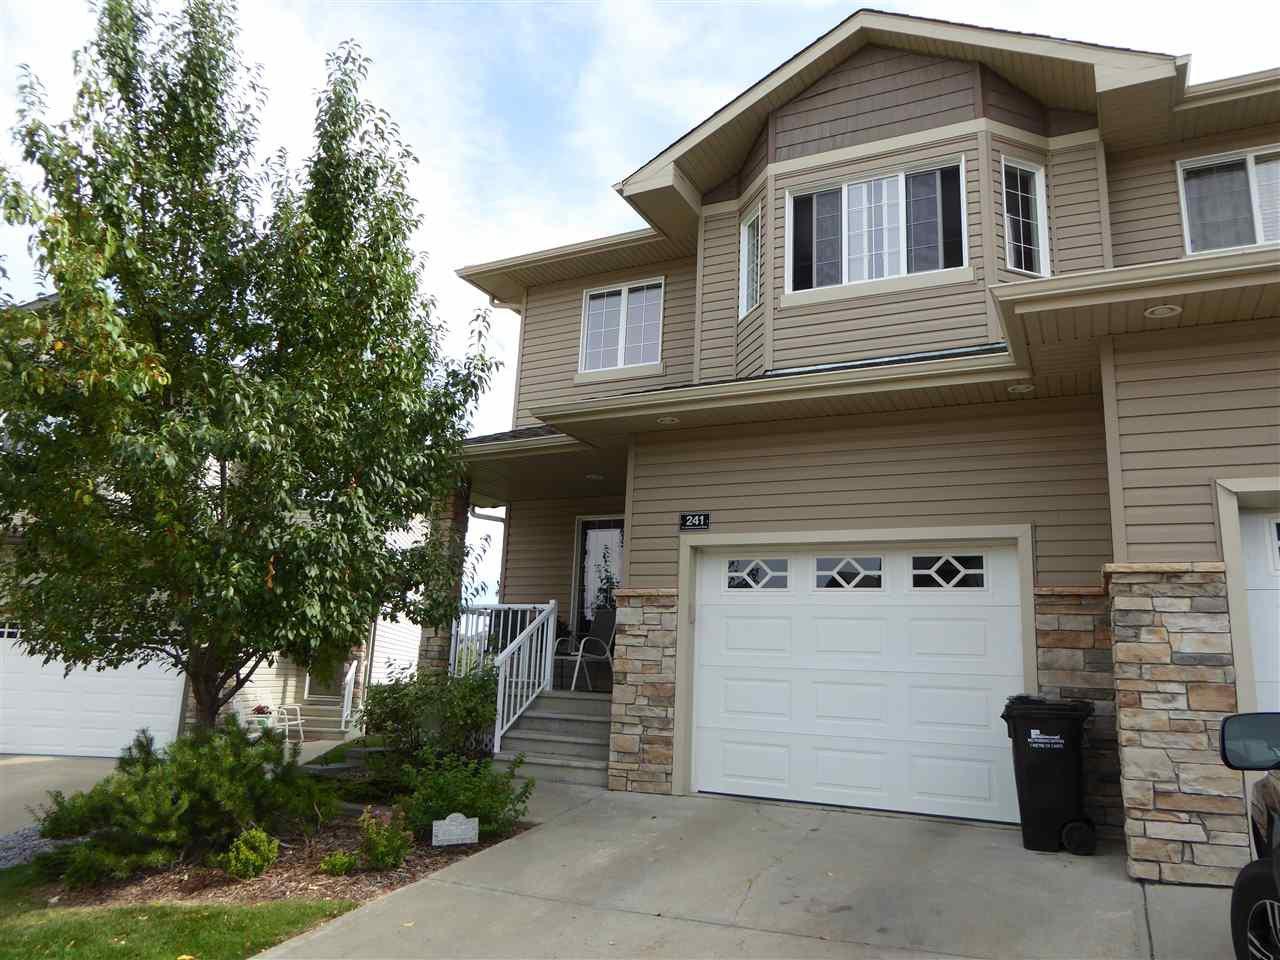 Main Photo: 241 41 SUMMERWOOD Boulevard: Sherwood Park House Half Duplex for sale : MLS®# E4212147